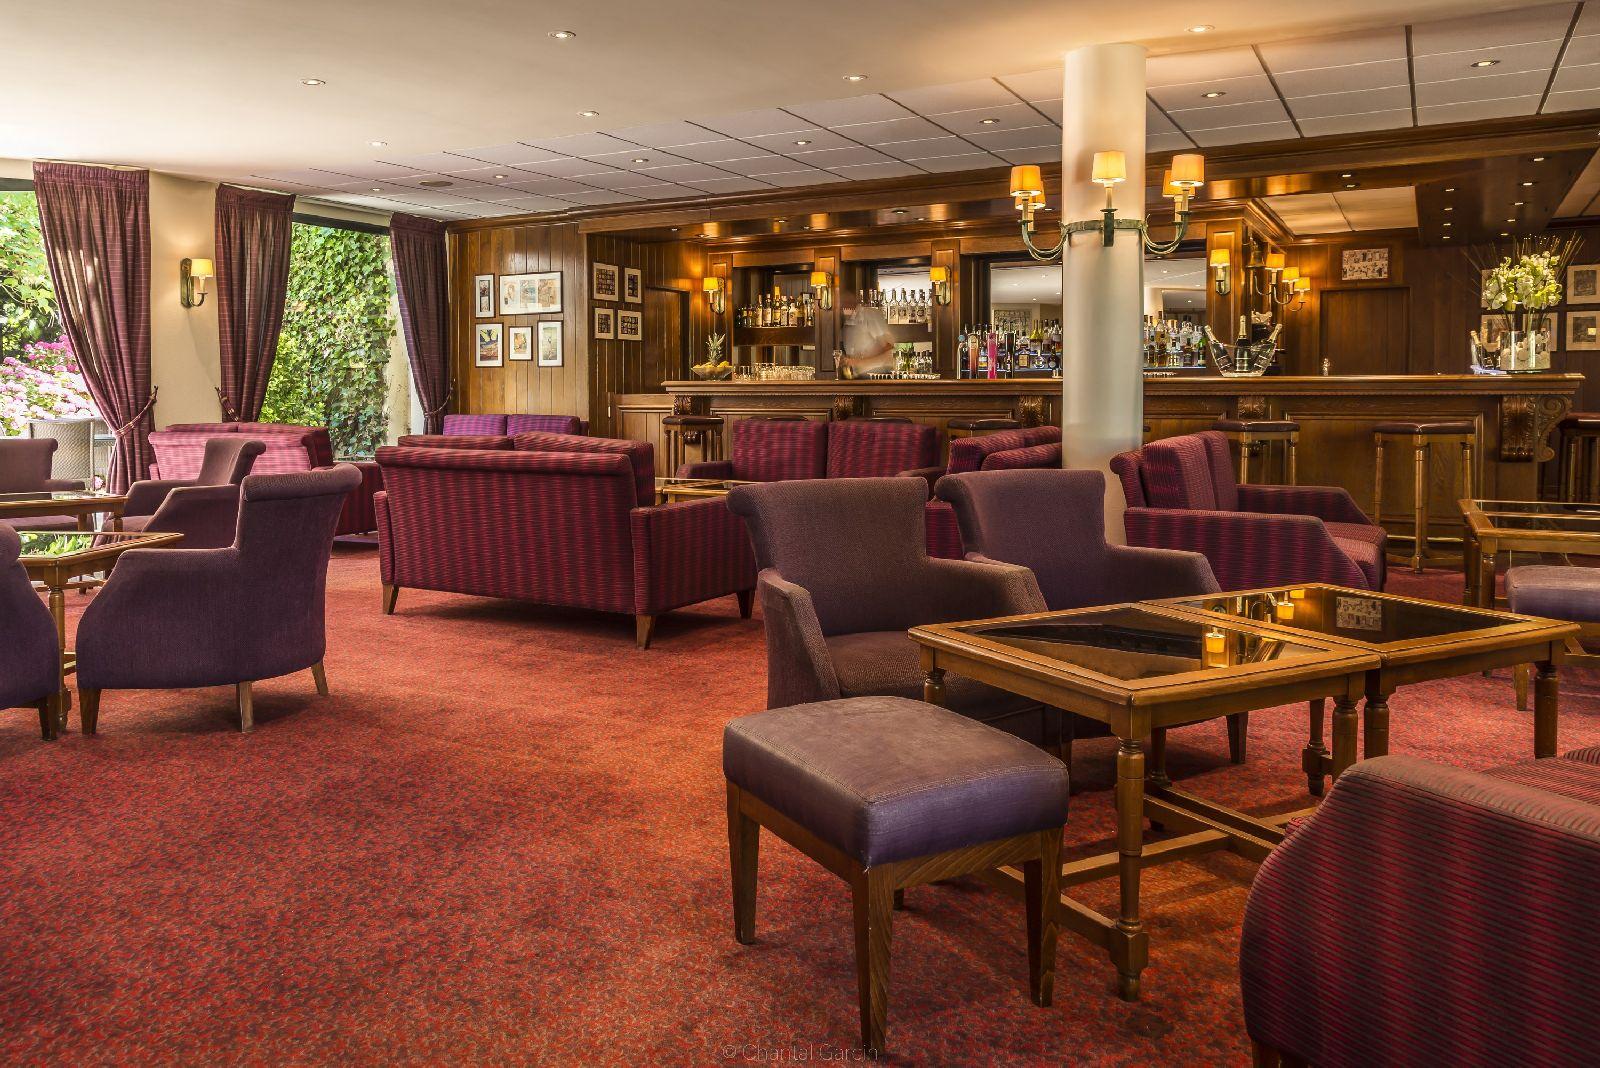 golf-expedition-golf-reizen-frankrijk-regio-pas-de-calais-hotel-du-parc-lounge-met-bar.jpg